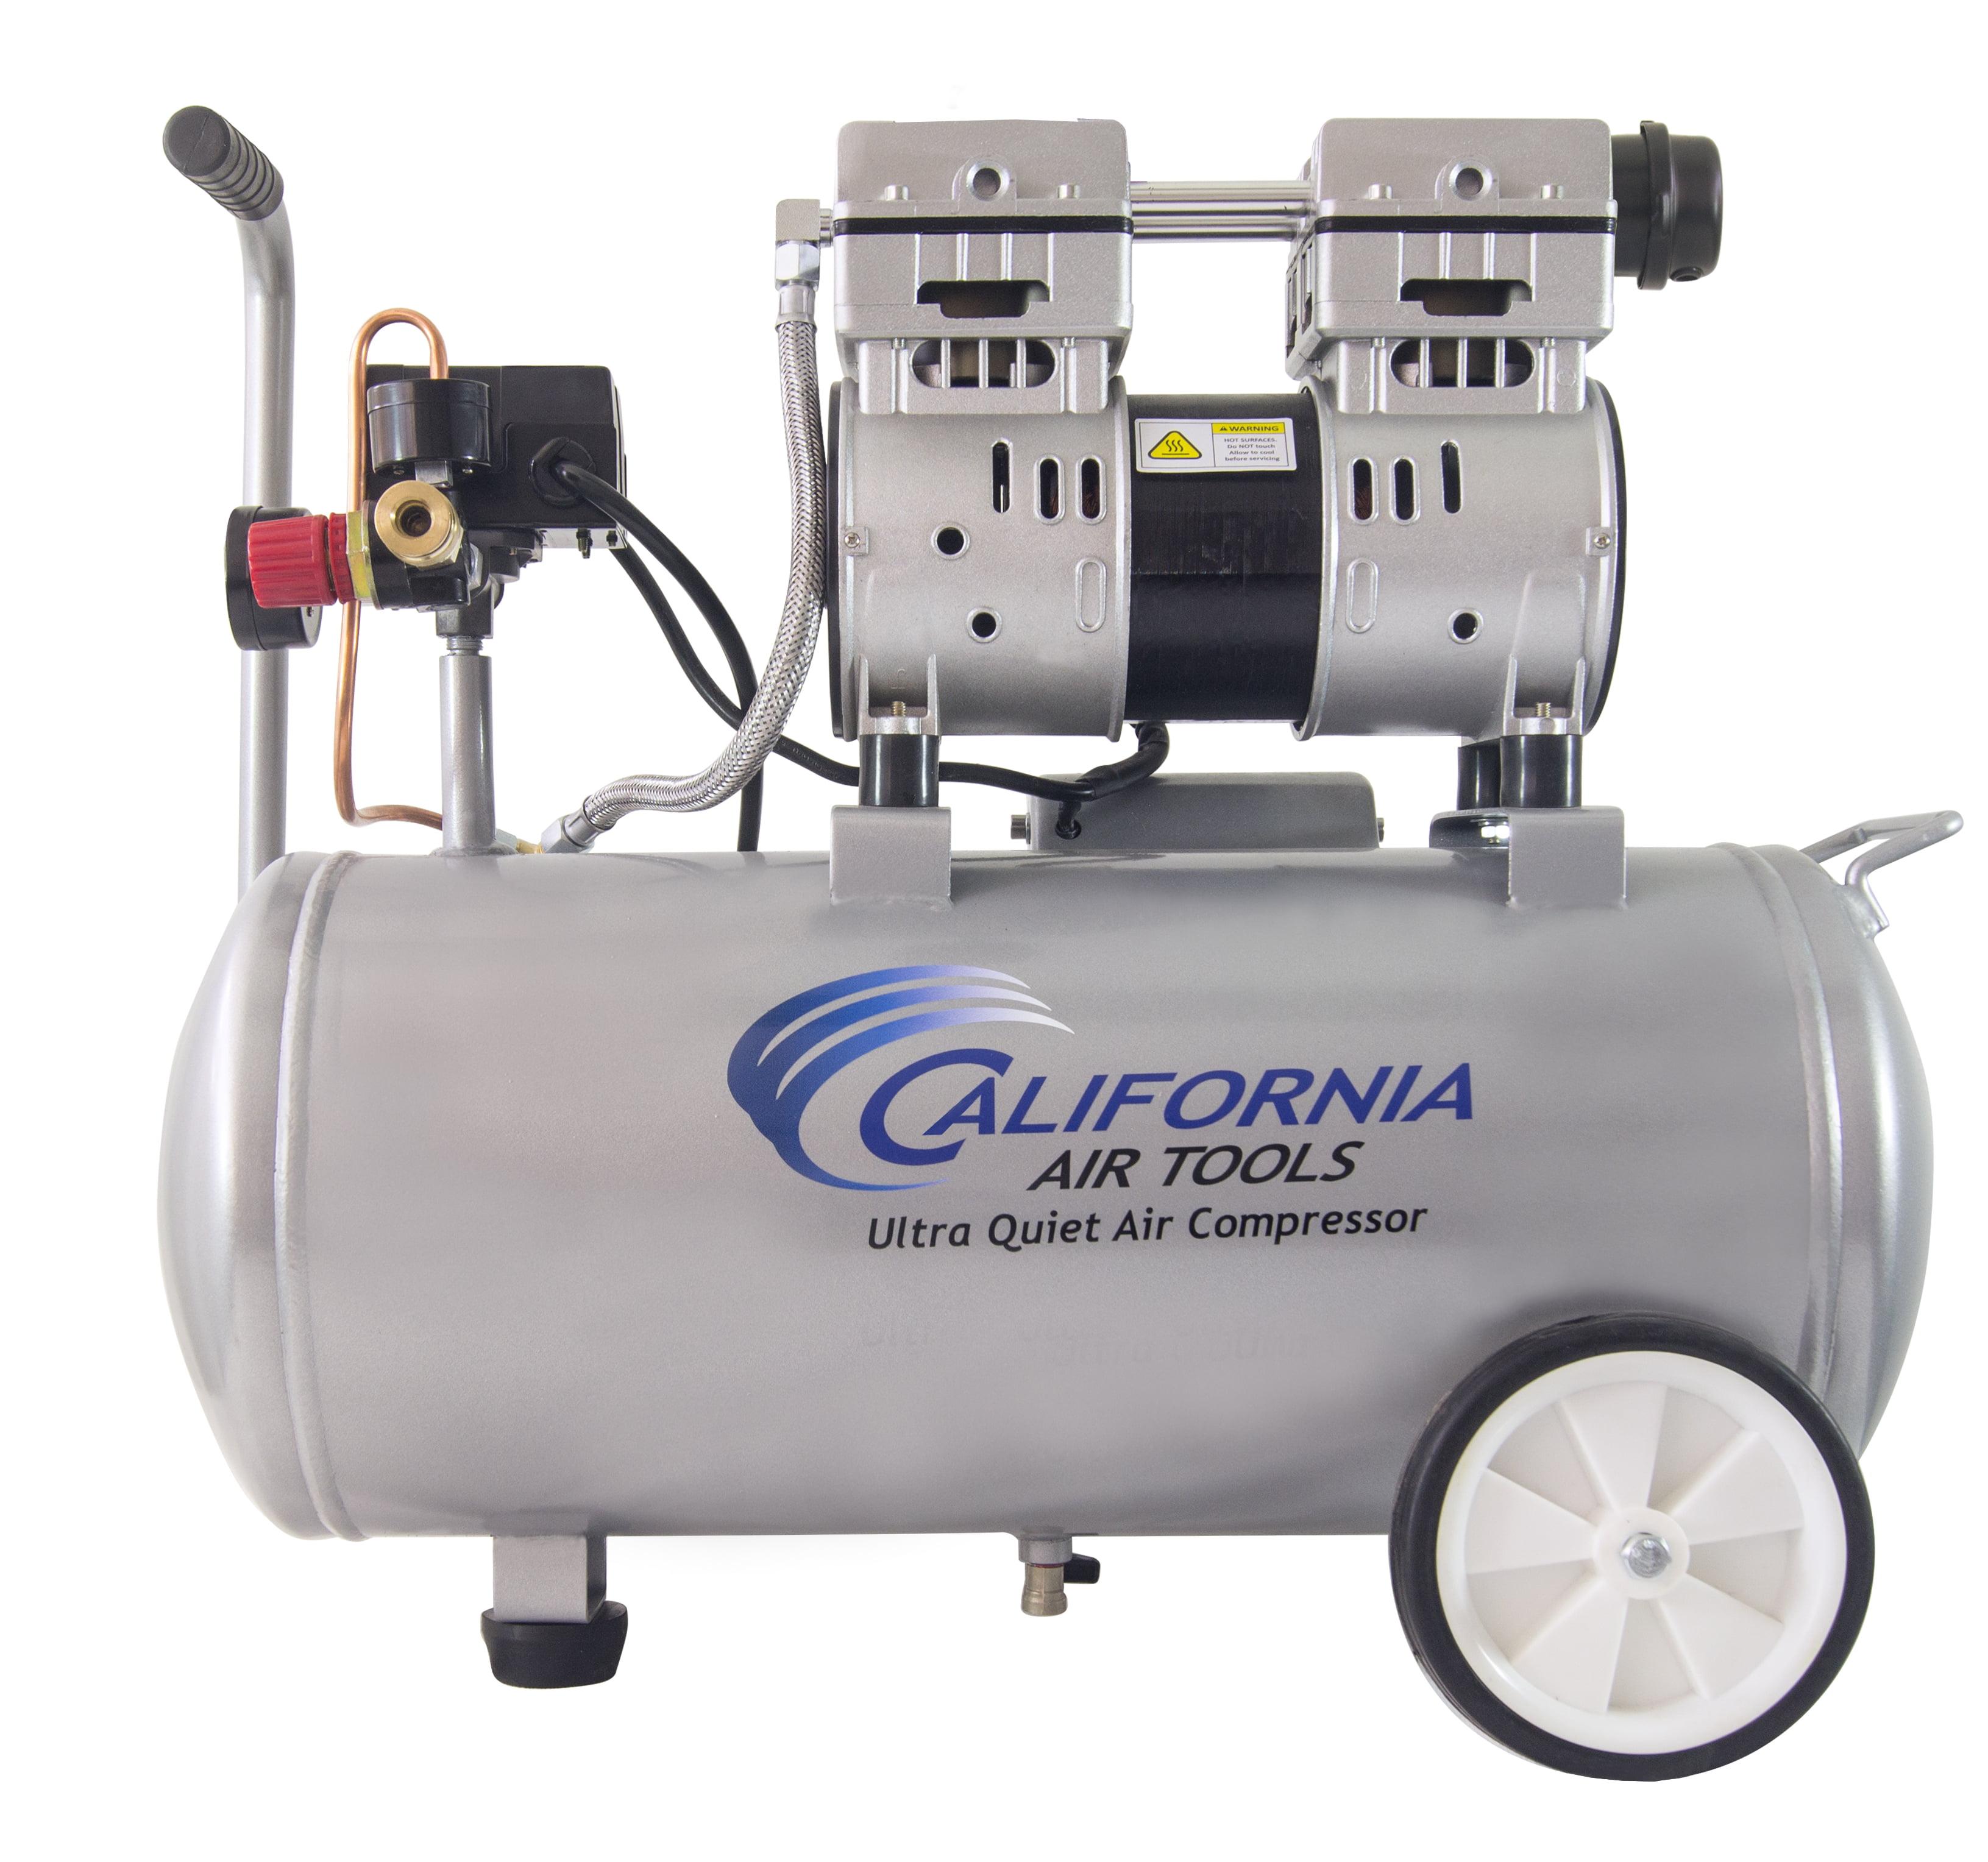 California Air Tools 8010 Ultra Quiet & Oil-Free 1.0 Hp, 8.0 Gal. Steel Tank Air Compressor